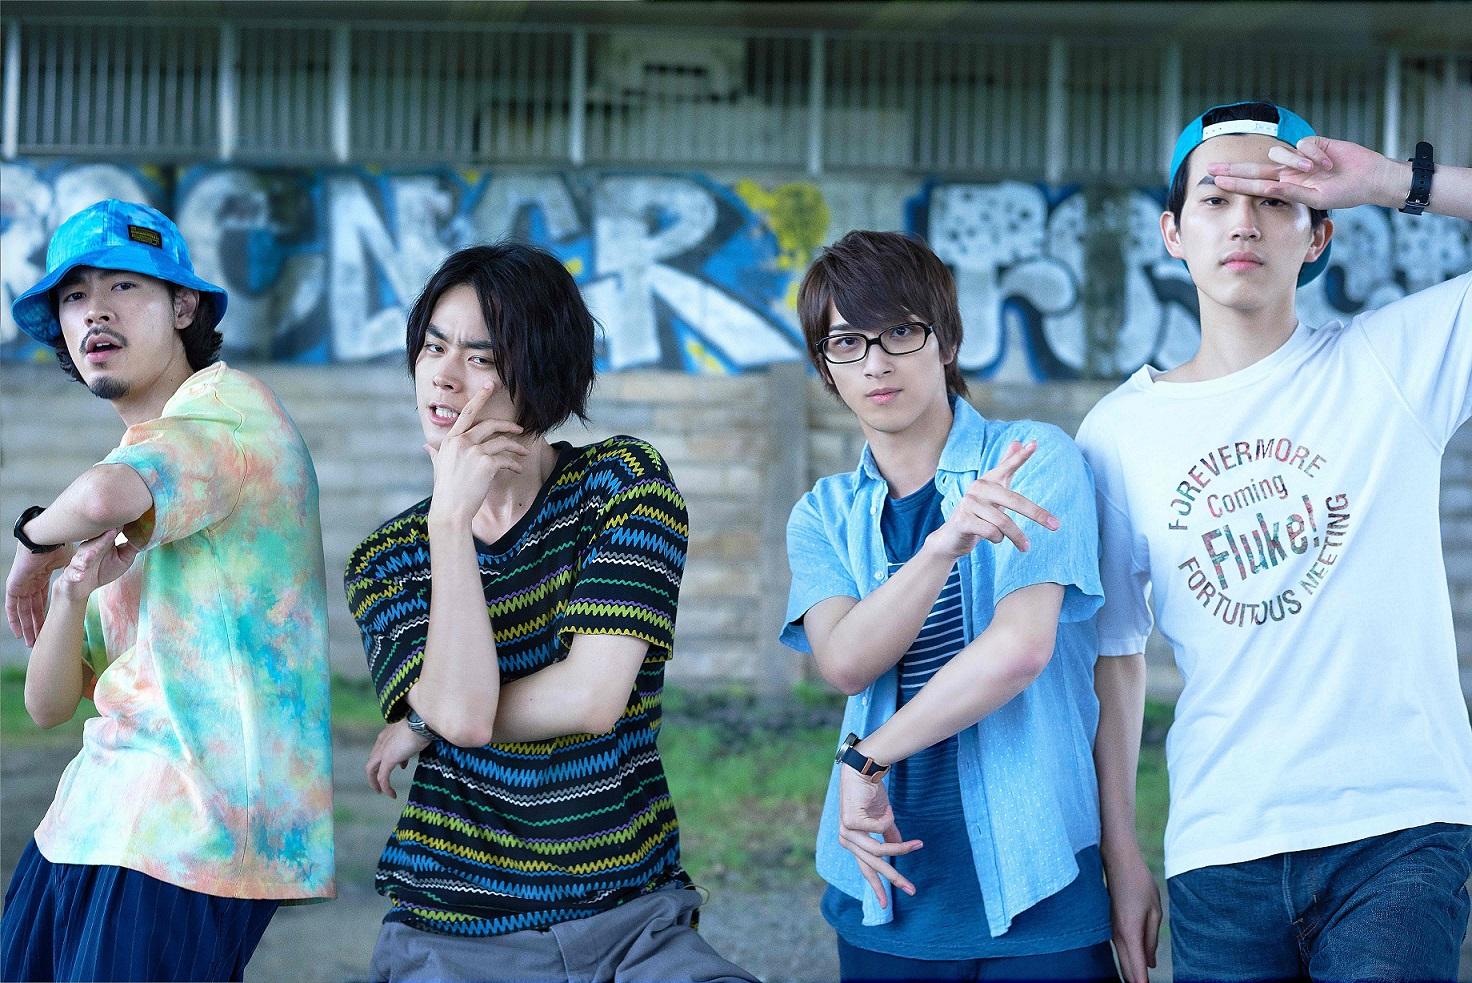 Mステにディーン・フジオカ&菅田将暉が出演で歌声披露に「ホントですか?!」「楽しみすぎる」サムネイル画像